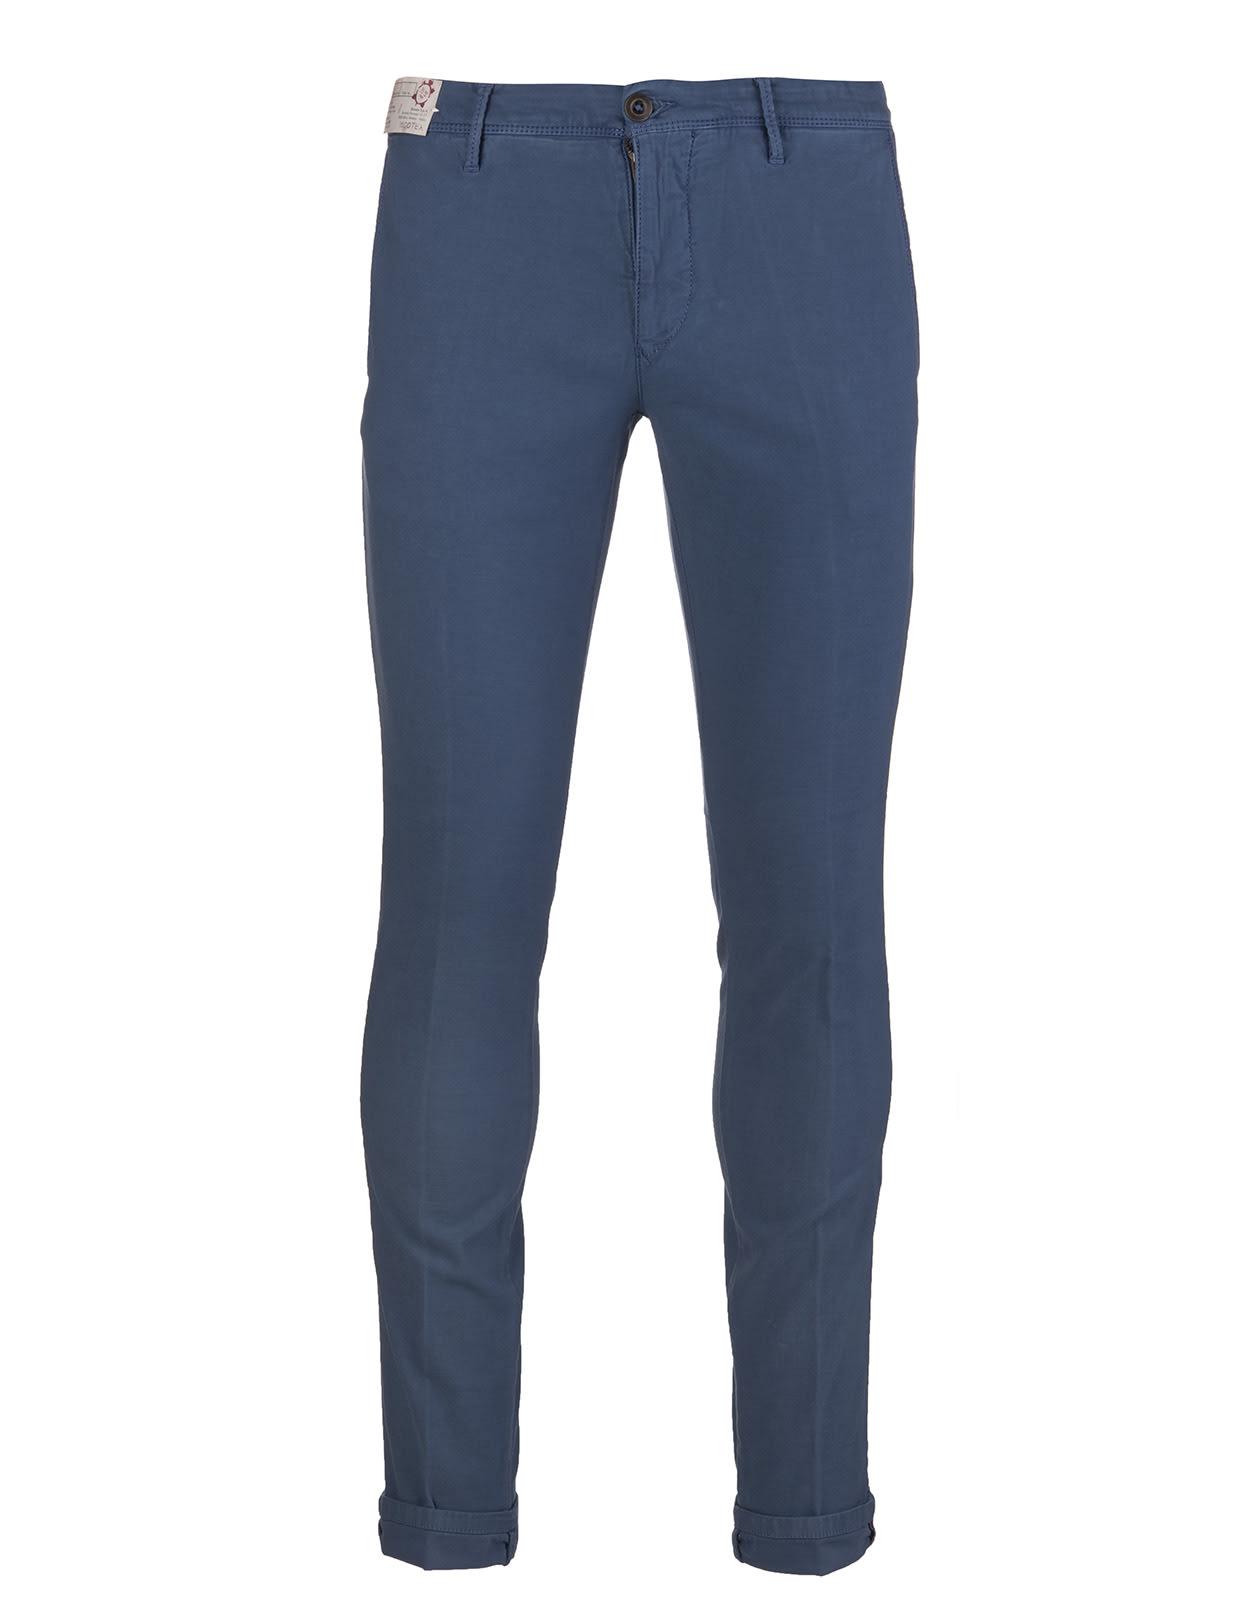 Blue Slacks Man Pants